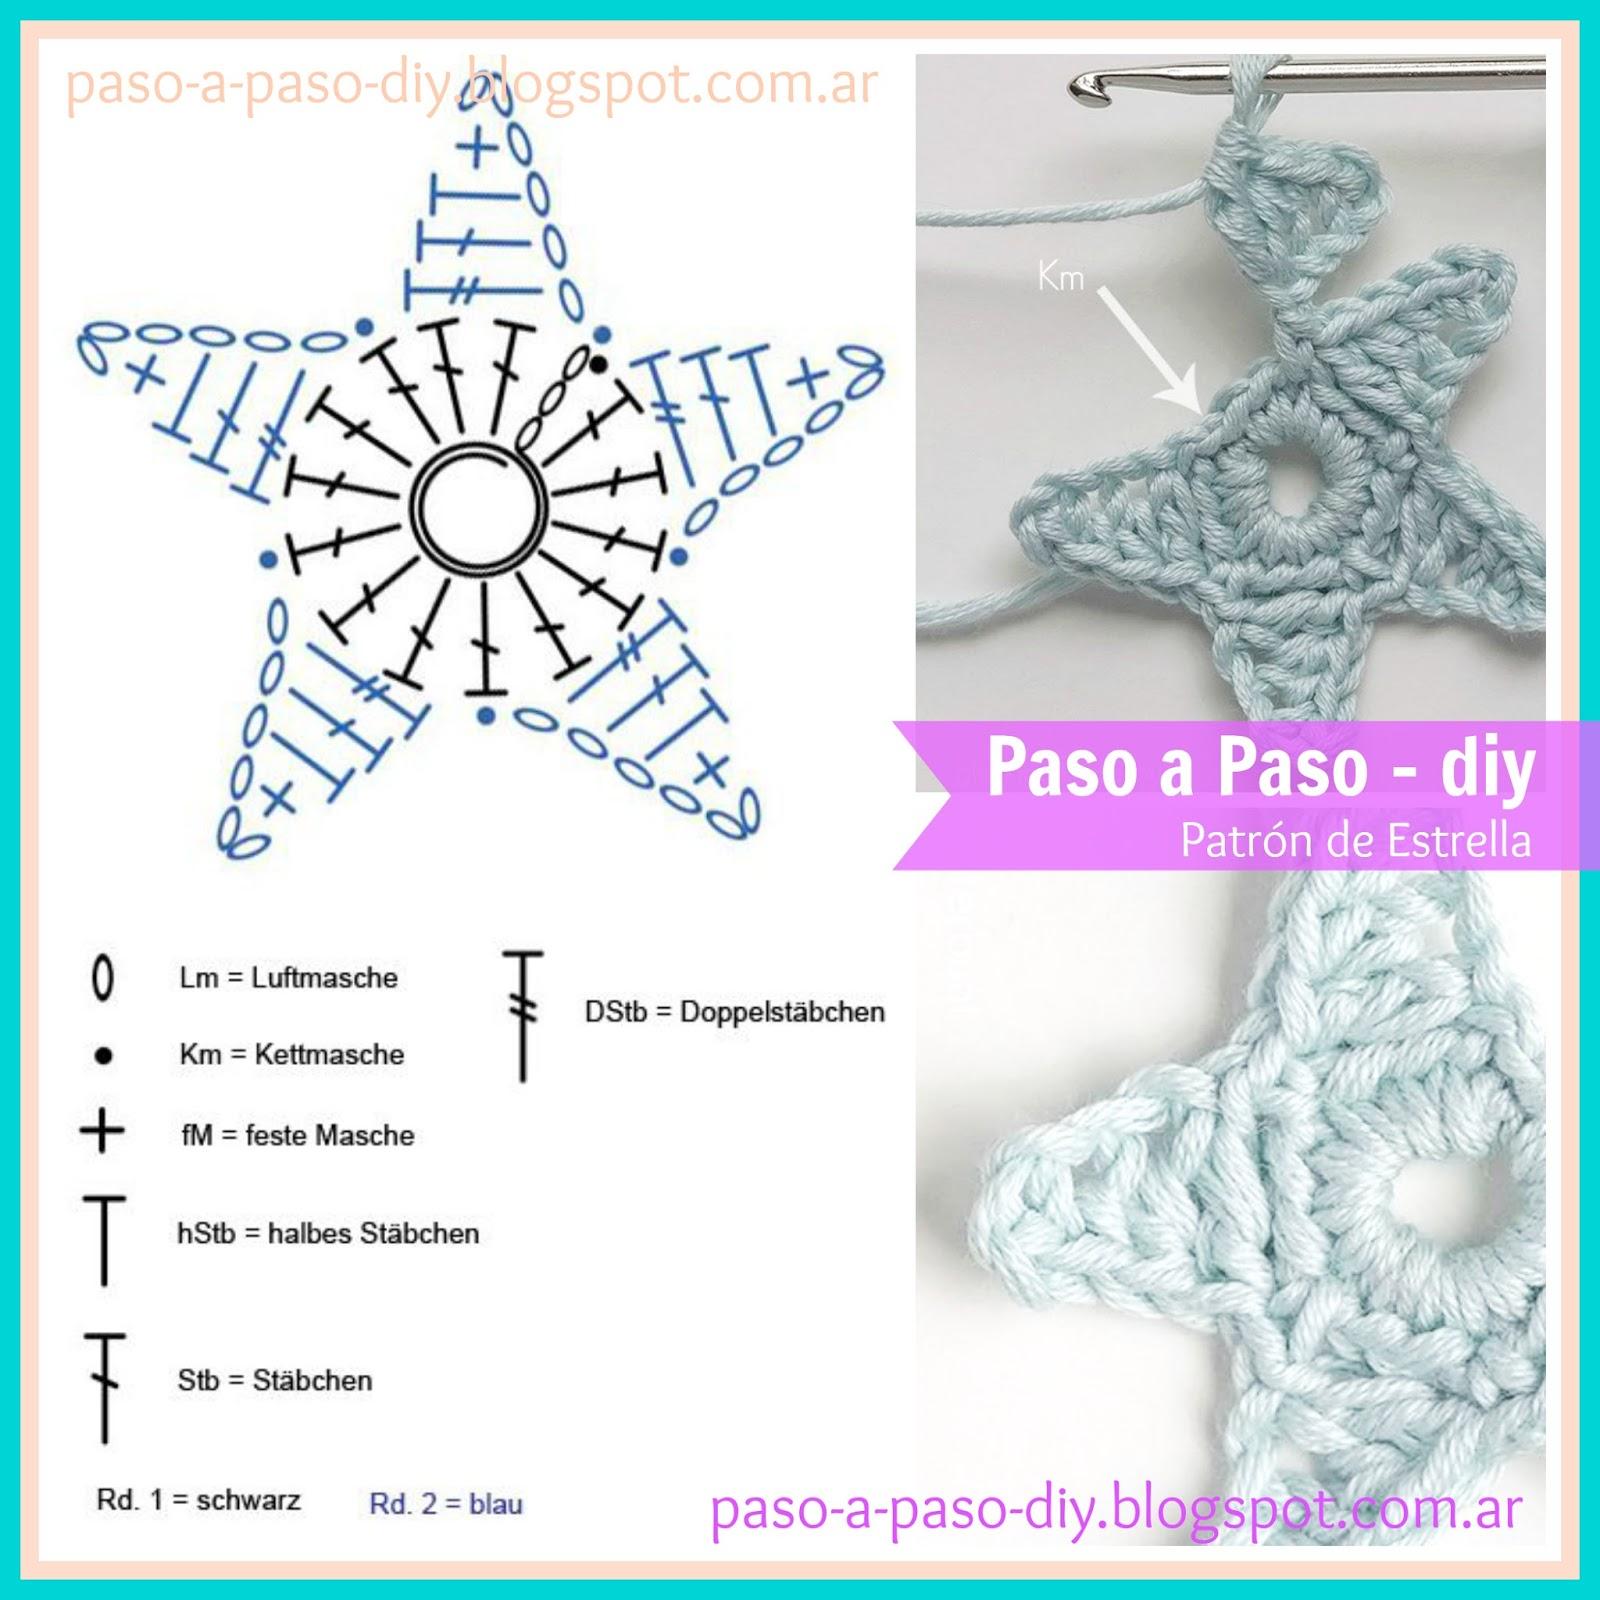 Dorable Modelo De Estrella Ganchillo Ornamento - Manta de Tejer ...